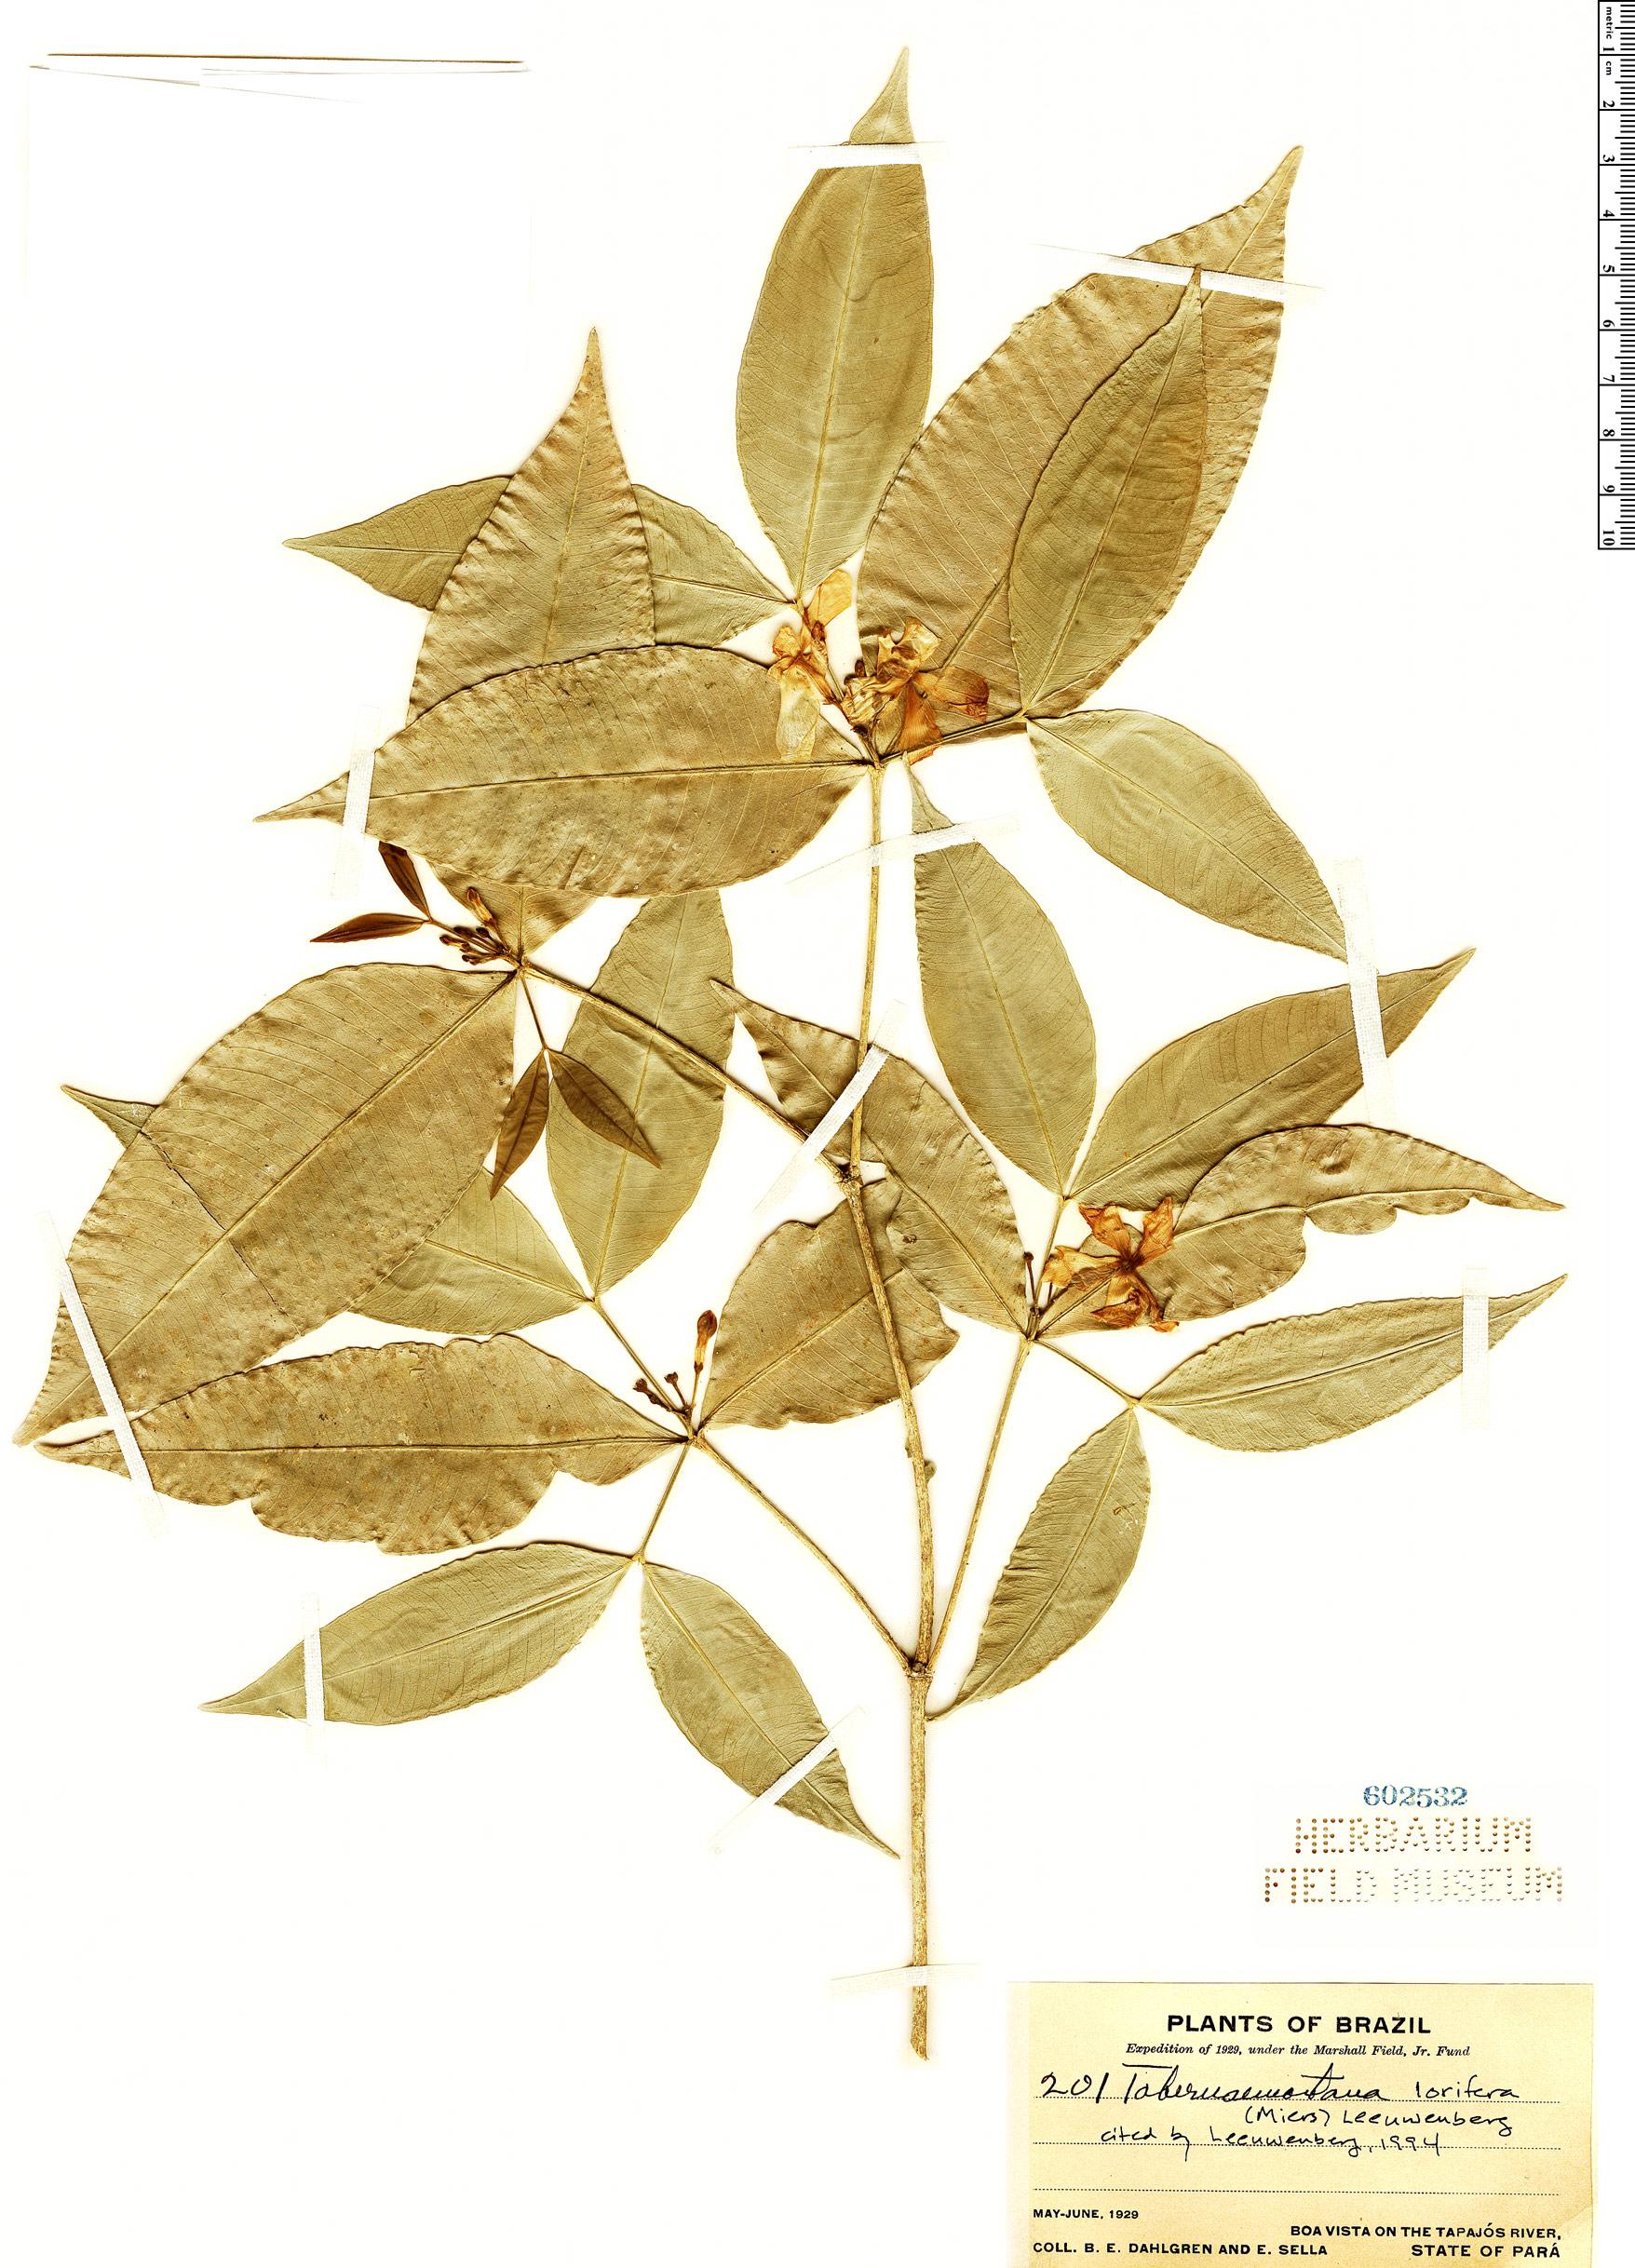 Specimen: Tabernaemontana lorifera